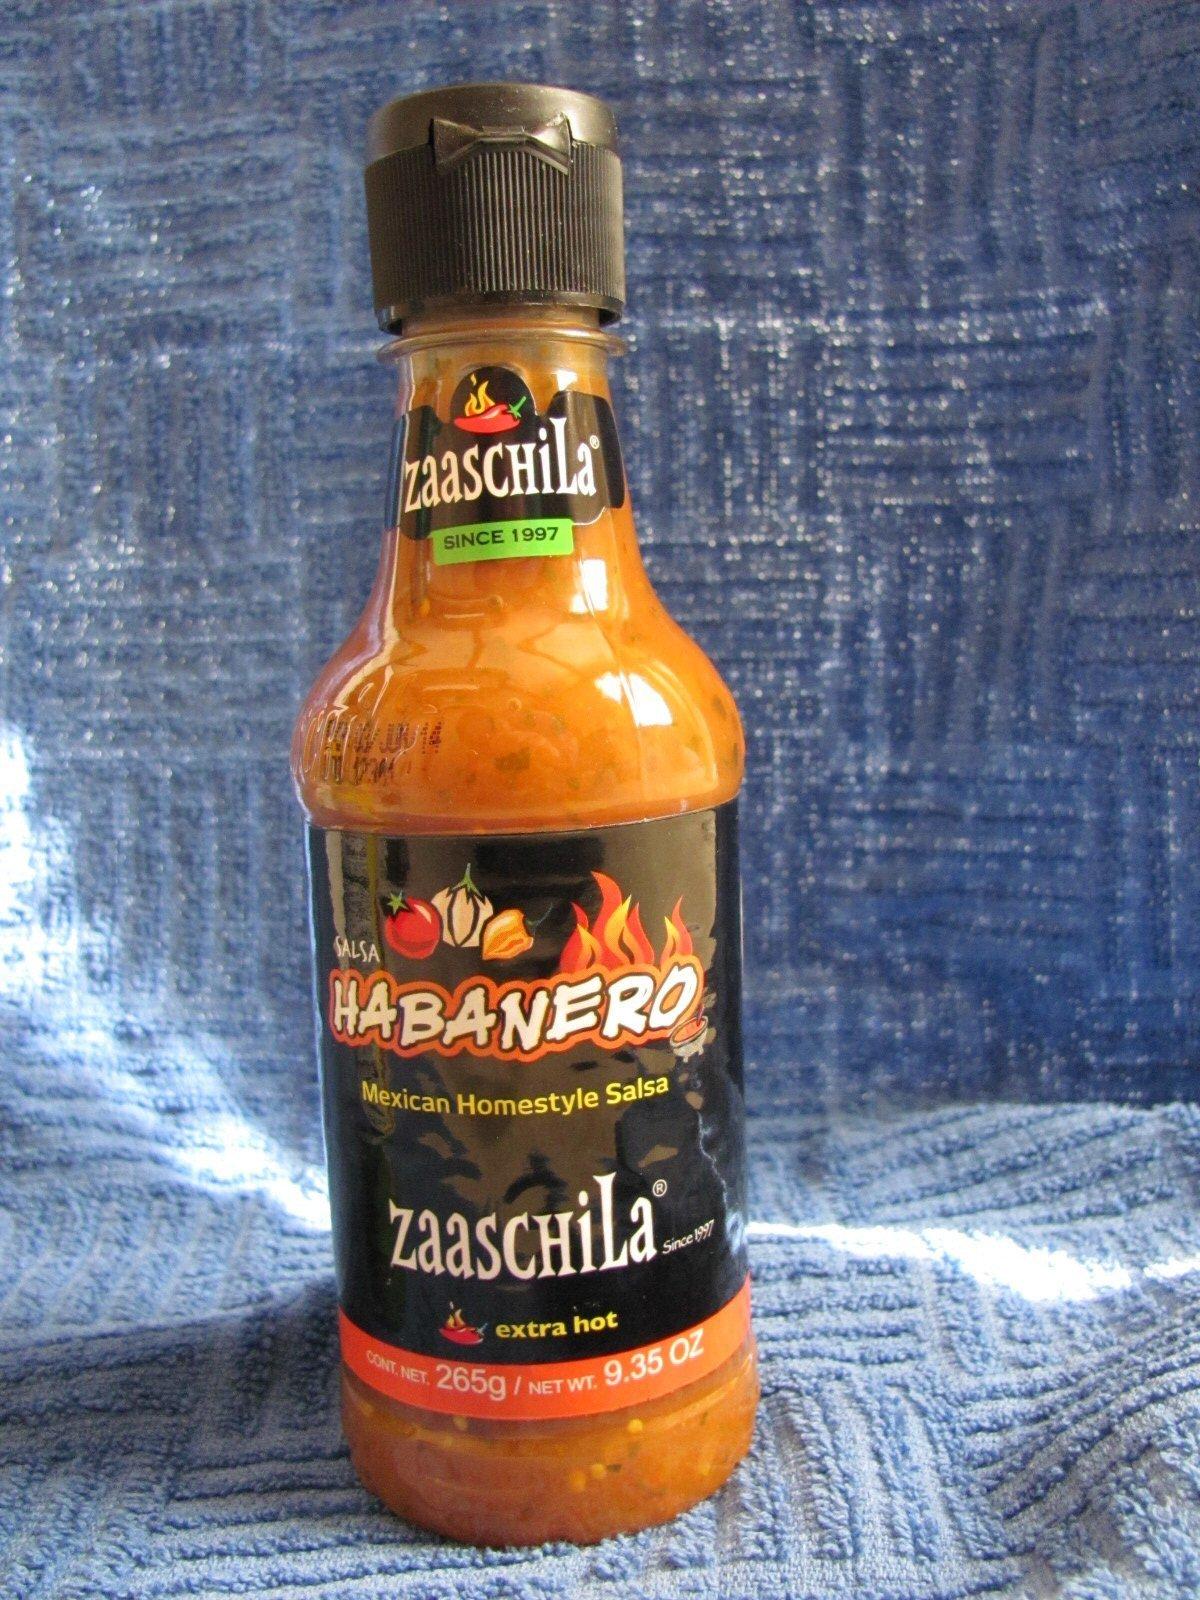 pepper sauce blog zaachila habanero mexican homestyle salsa